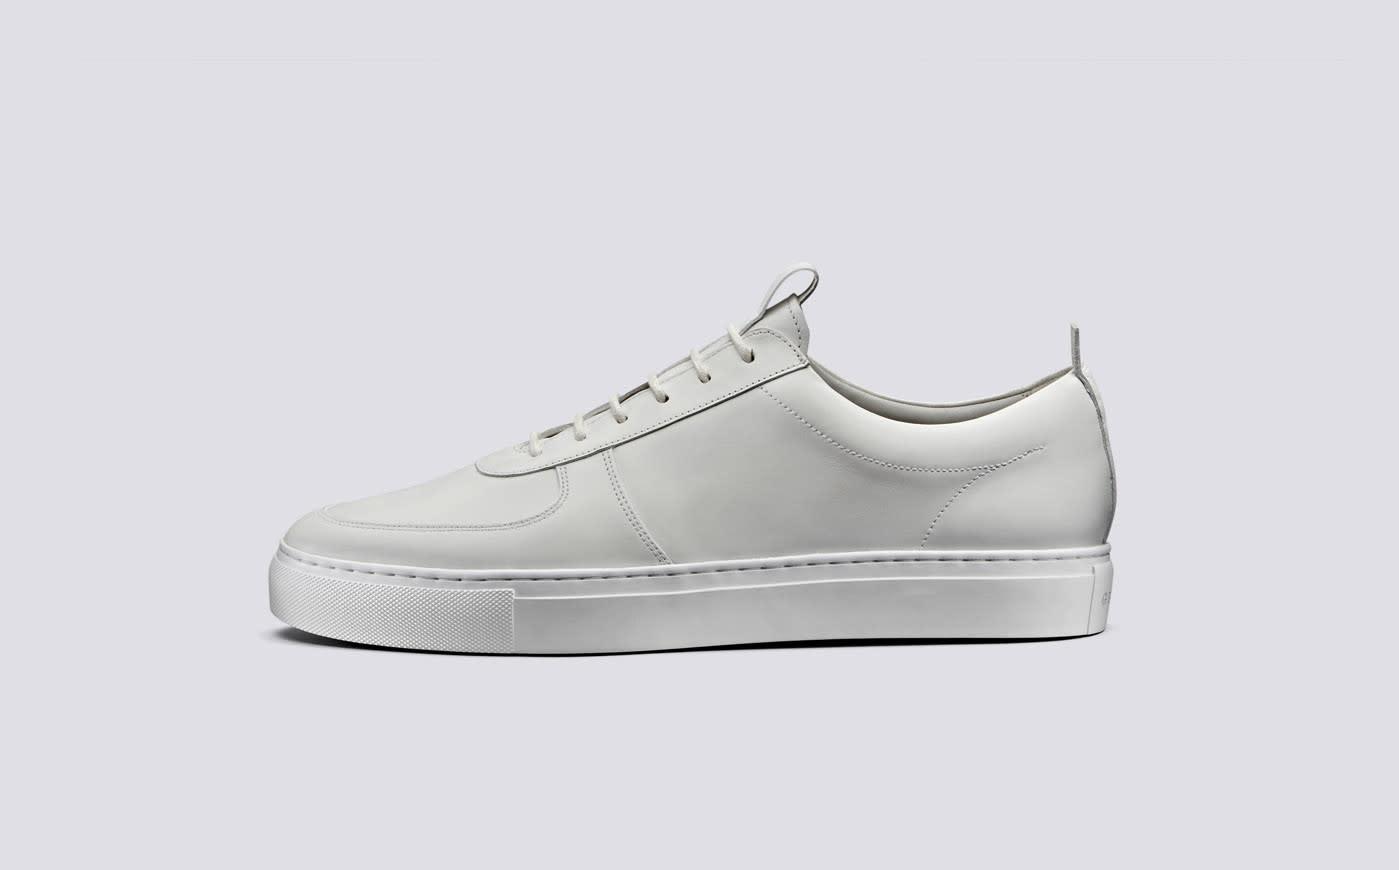 Sneaker 22 White Calf Leather-3